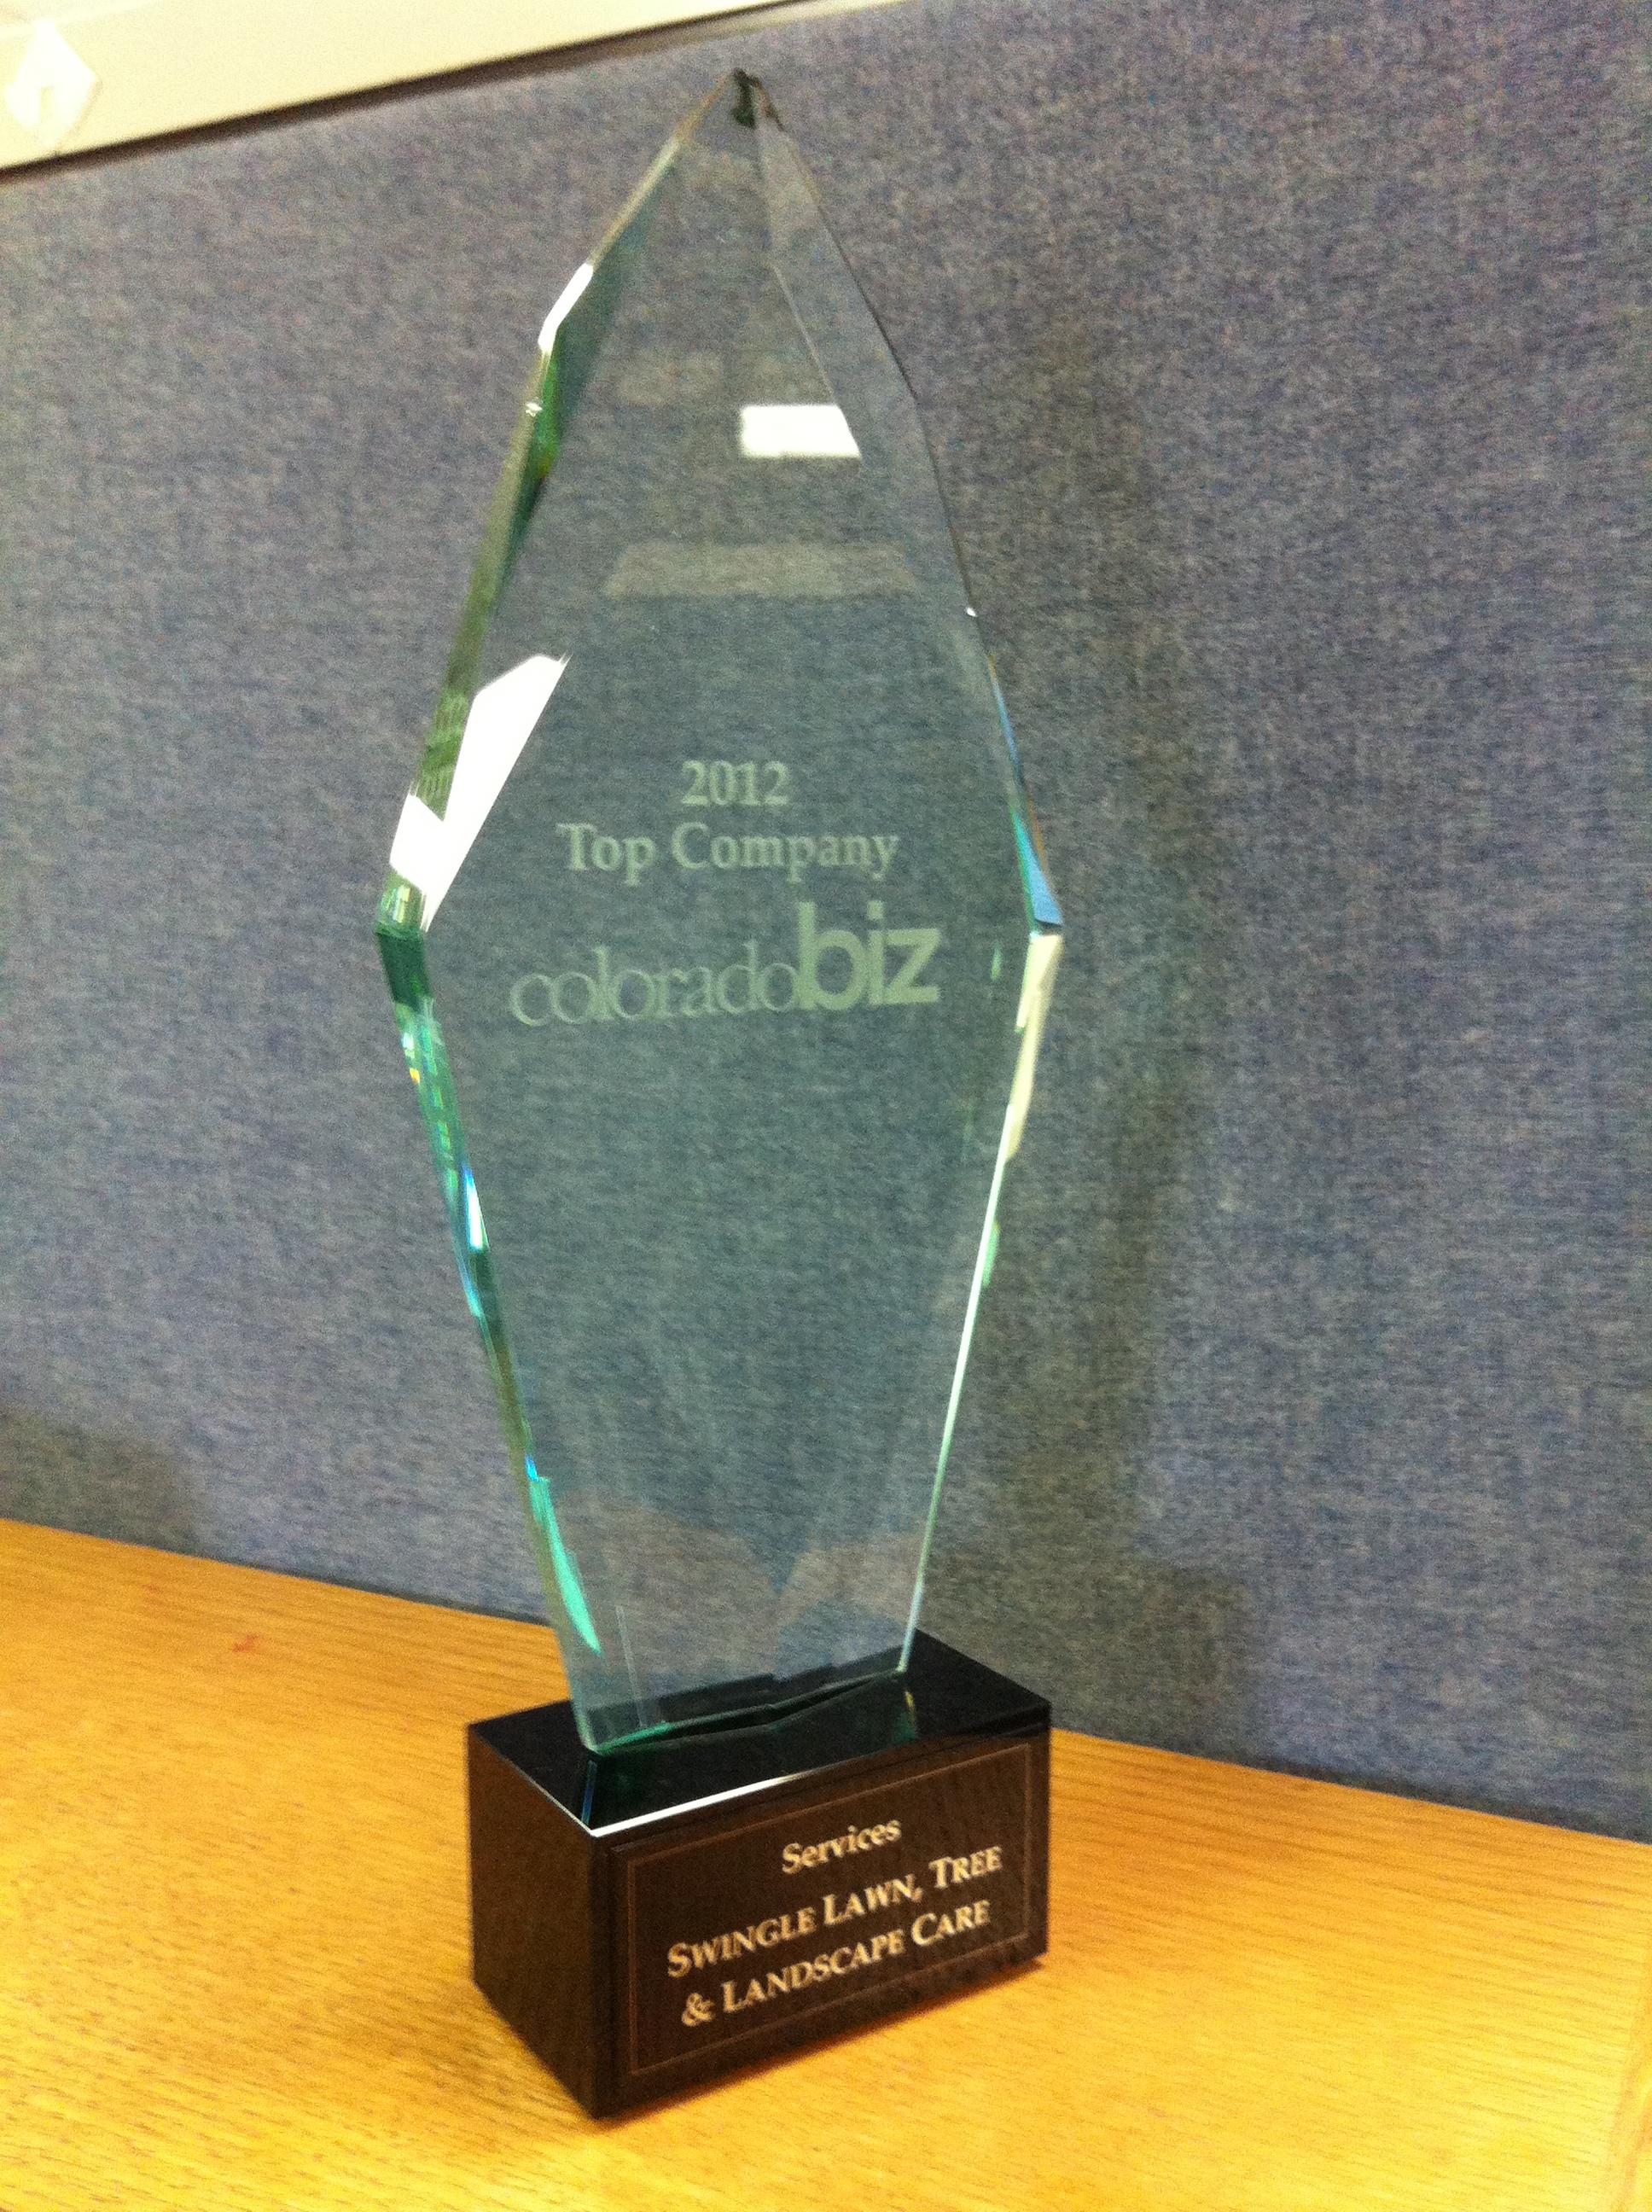 Swingle Named Top Company By Colorado Business Magazine